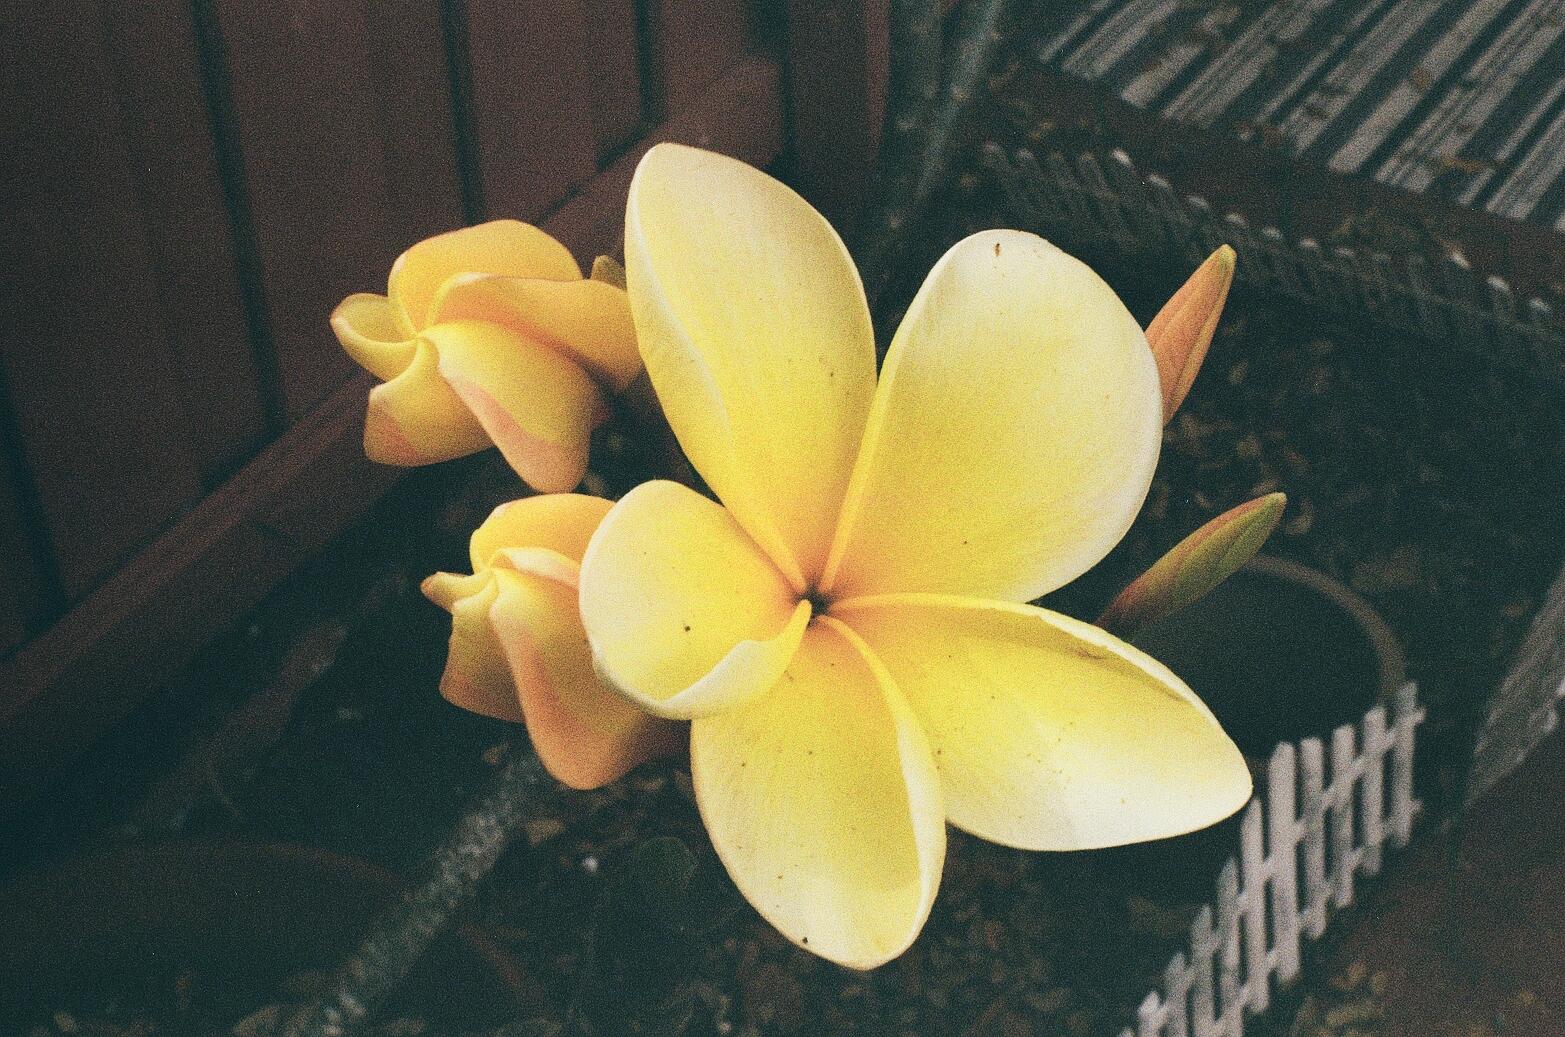 First of the Season | Joy Marie | Pentax K1000 | Kodak Gold 200